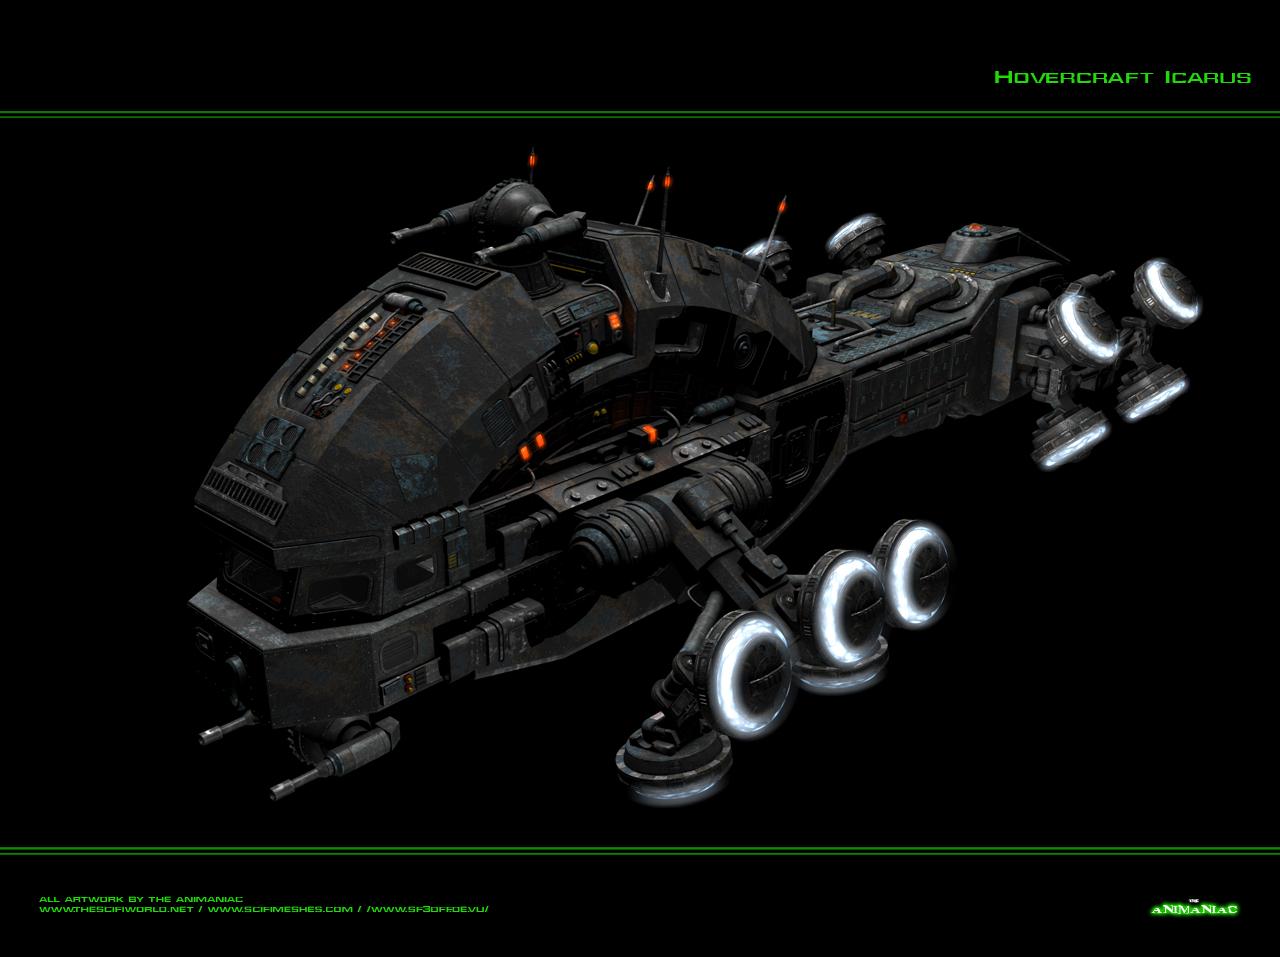 Matrix Hovercraft Icarus by Animaniacarts on DeviantArt